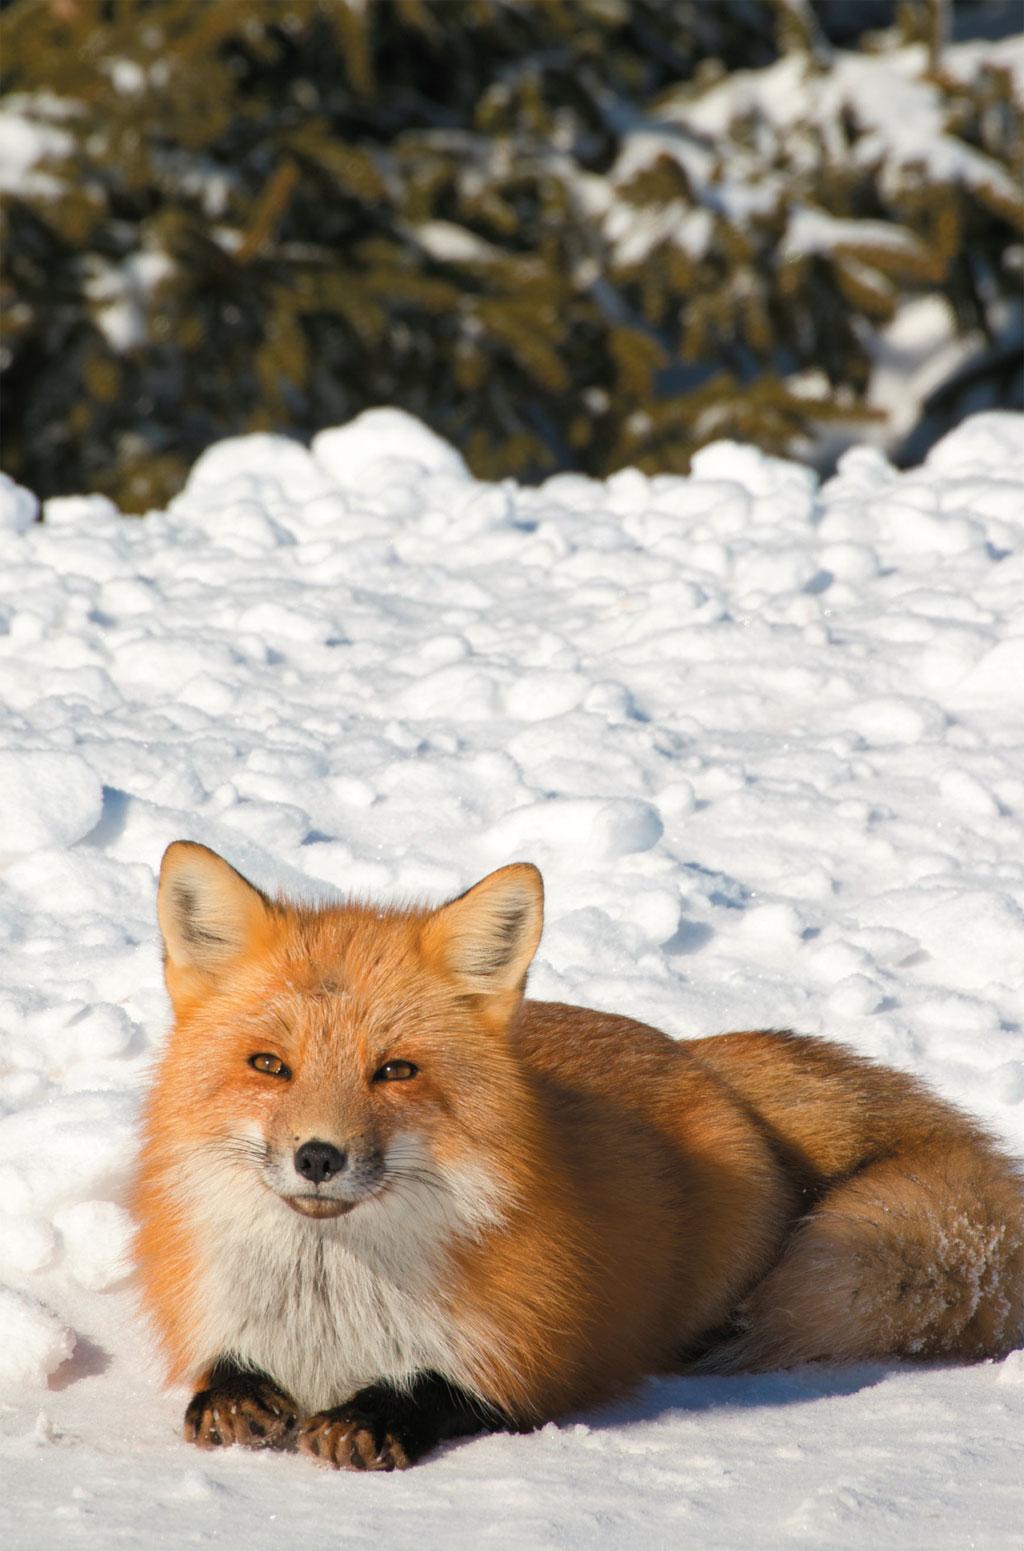 Raposa no Prince Edward Island National Park, no Canadá